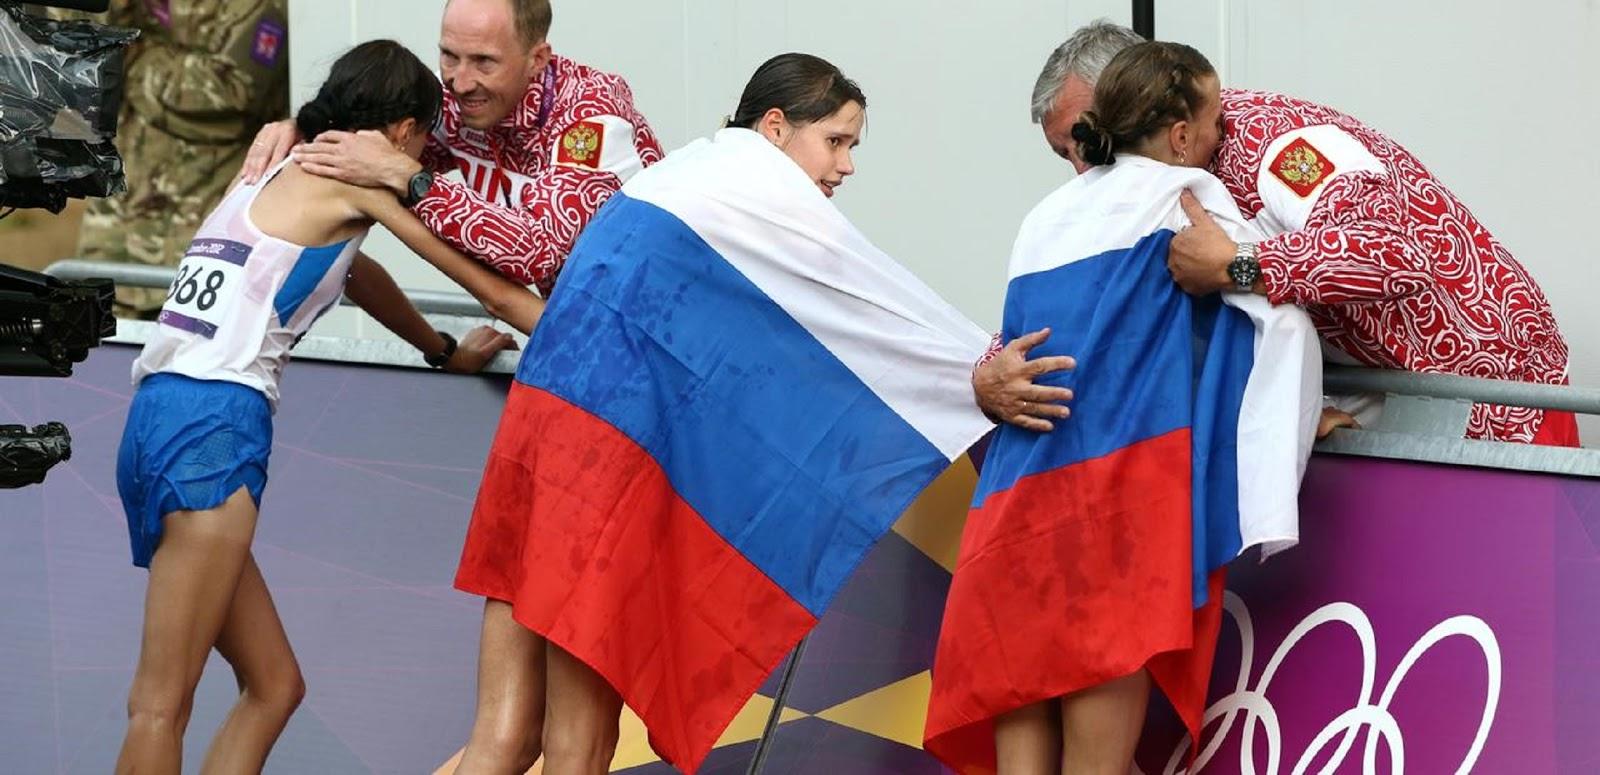 RUSSIA 2016 RIO OLYMPICS 6